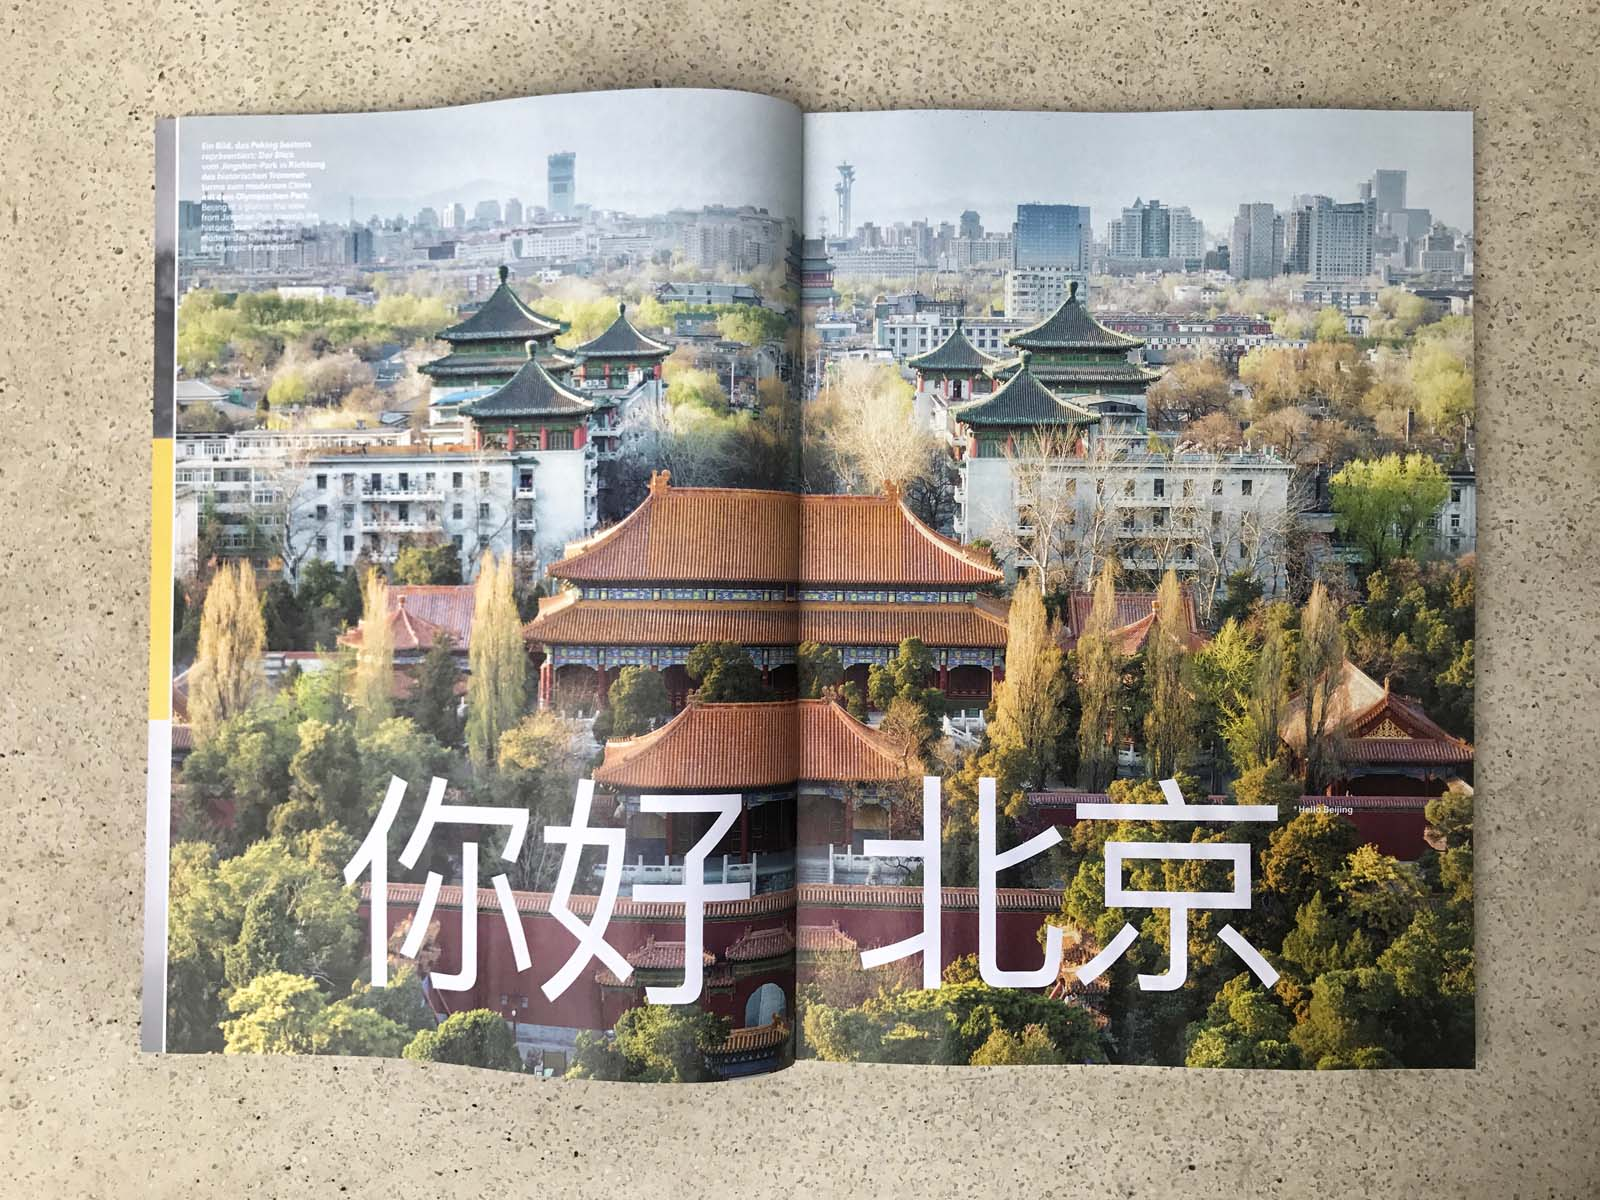 Swiss Magazine Peking 09 | nuvu